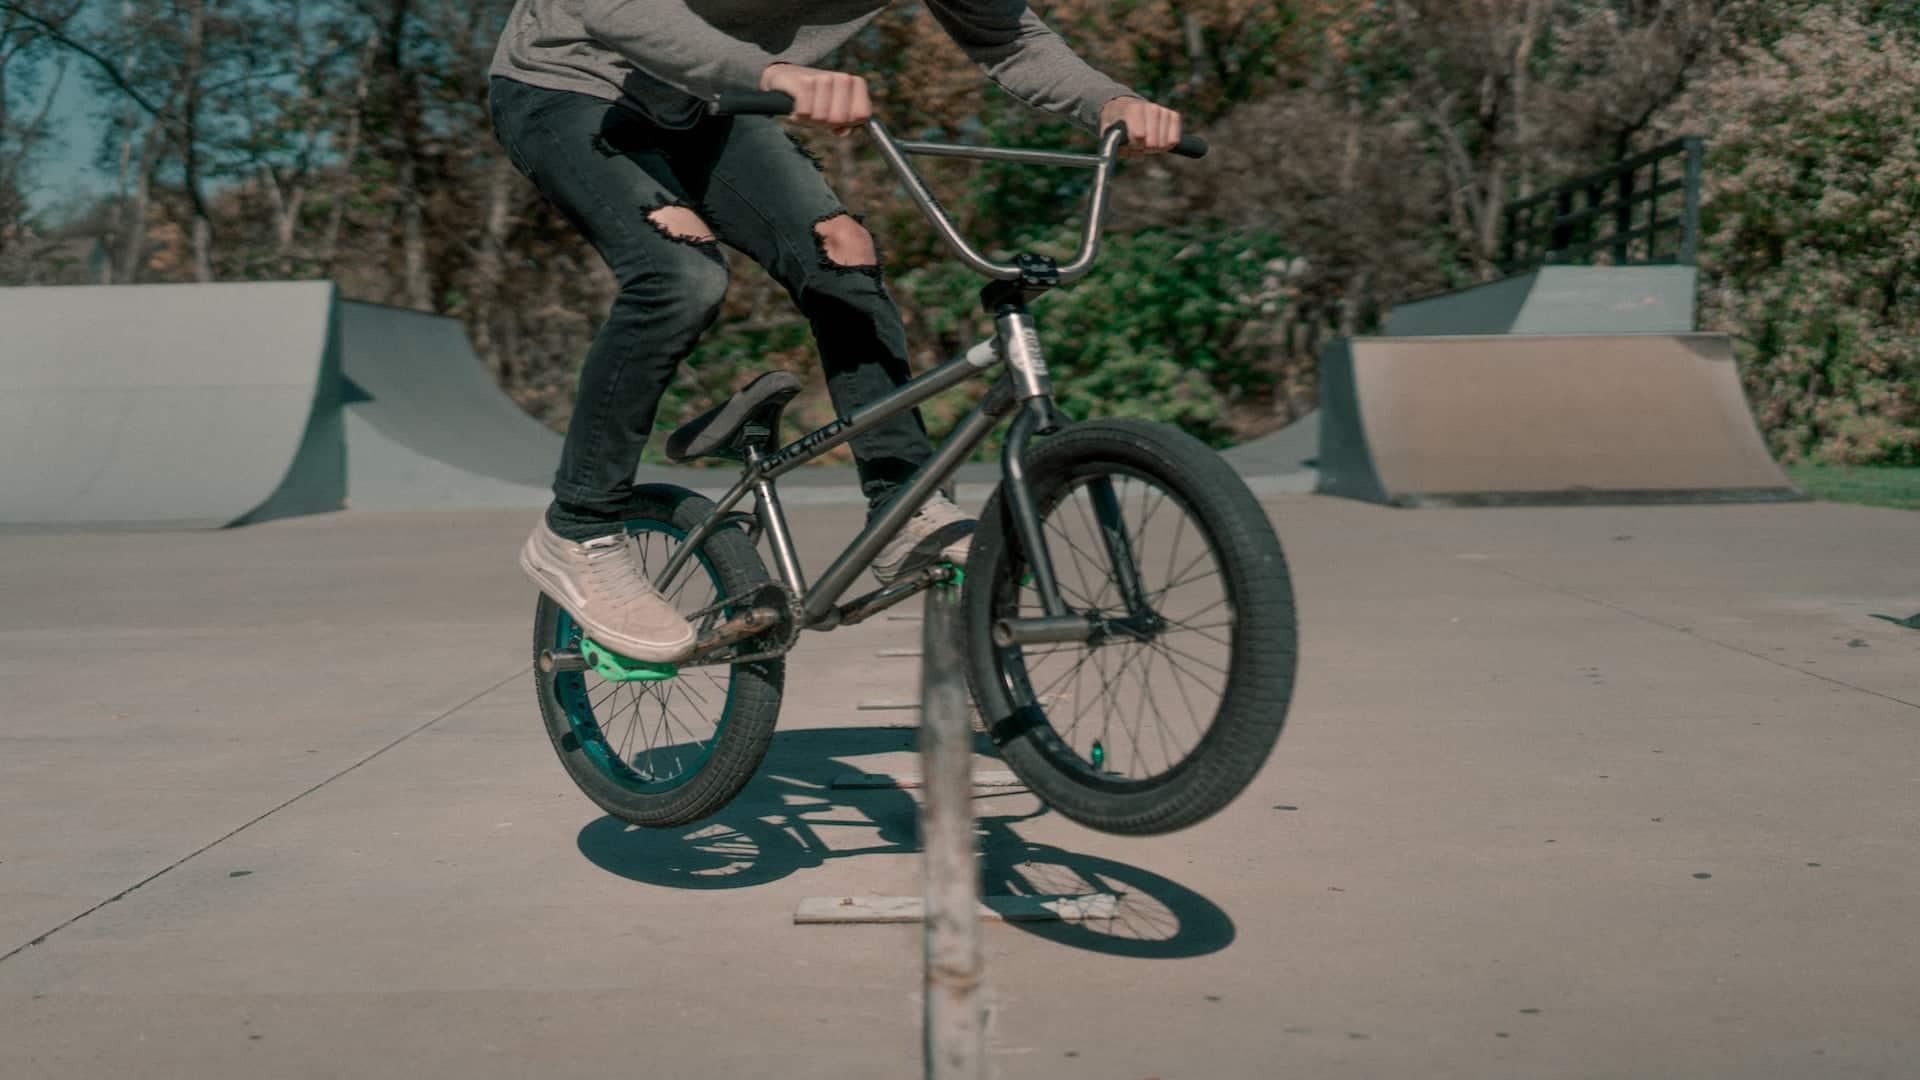 Bicicletas BMX: ¿Cuál es la mejor del 2021?